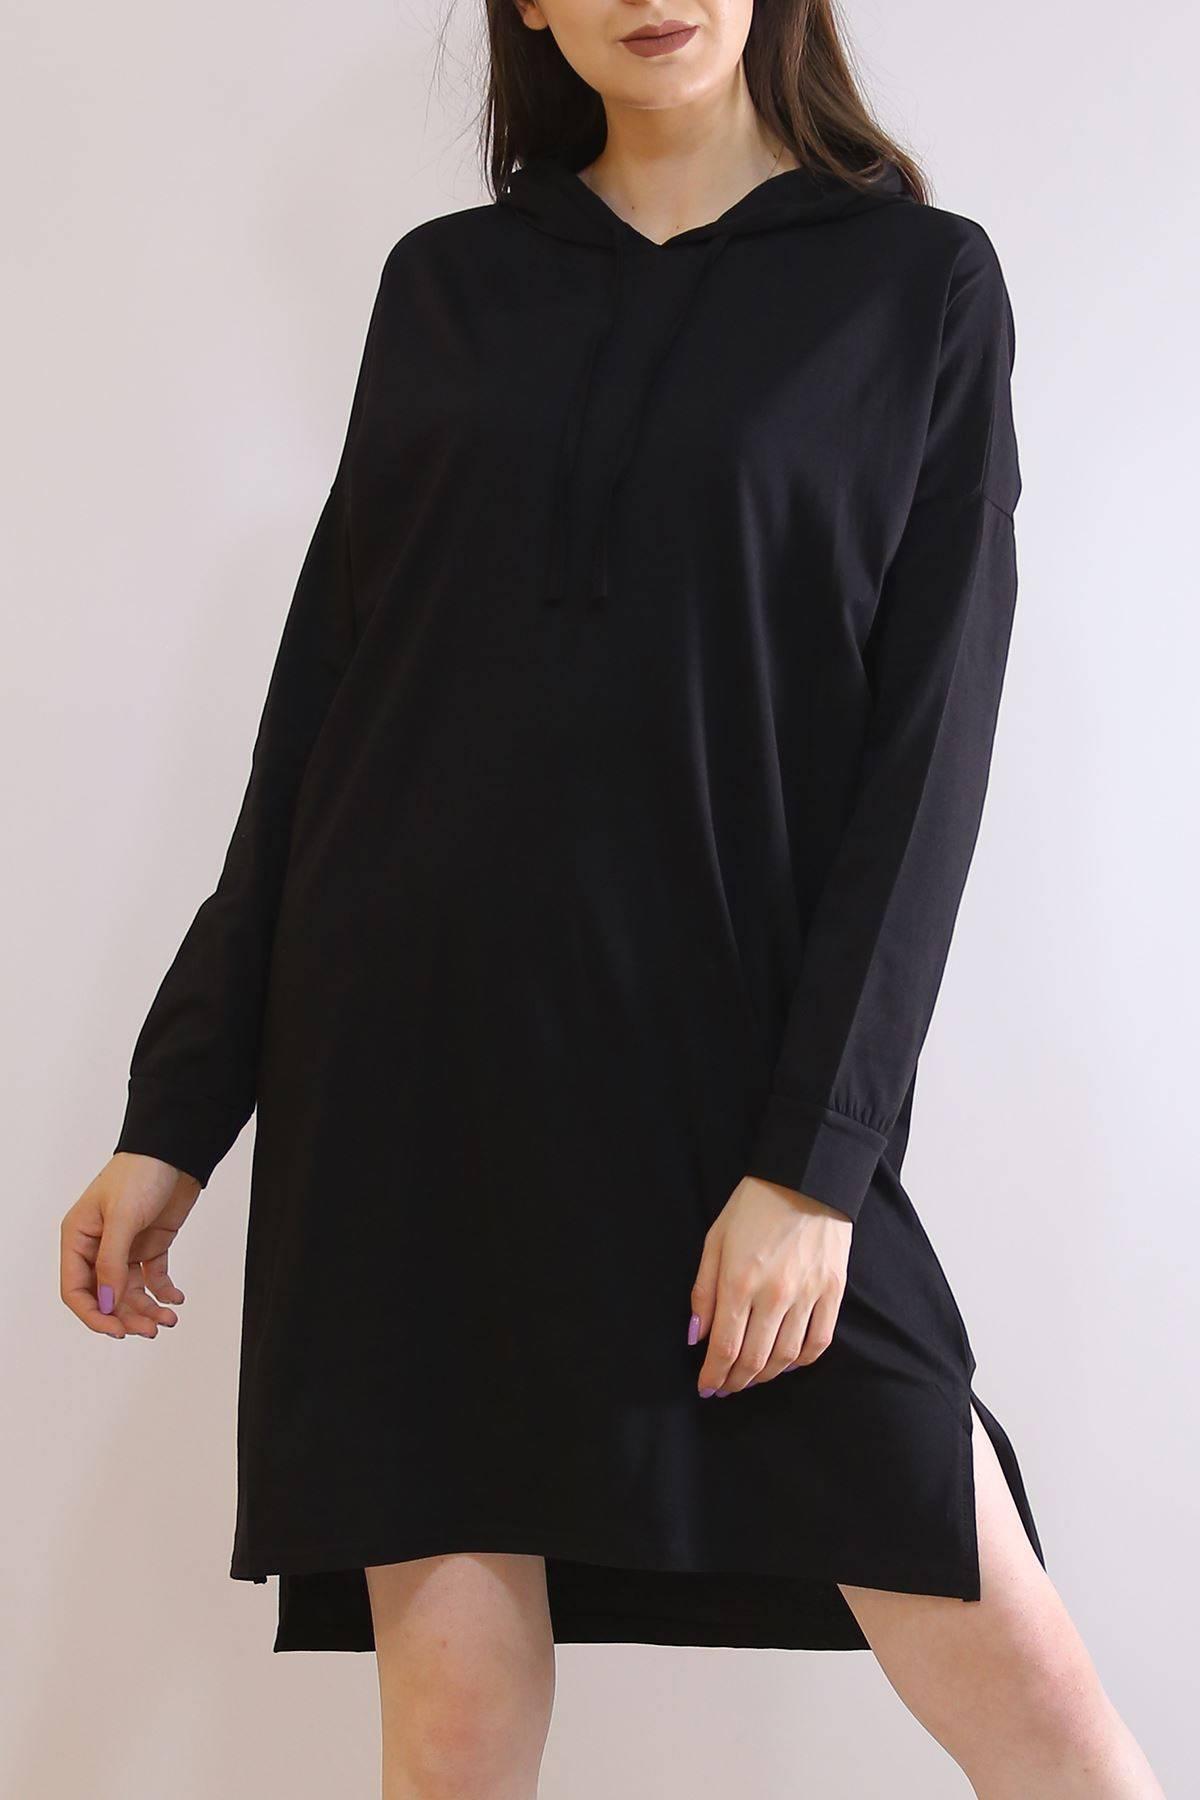 Kapüşonlu Penye Tunik Siyah - 2896.105.